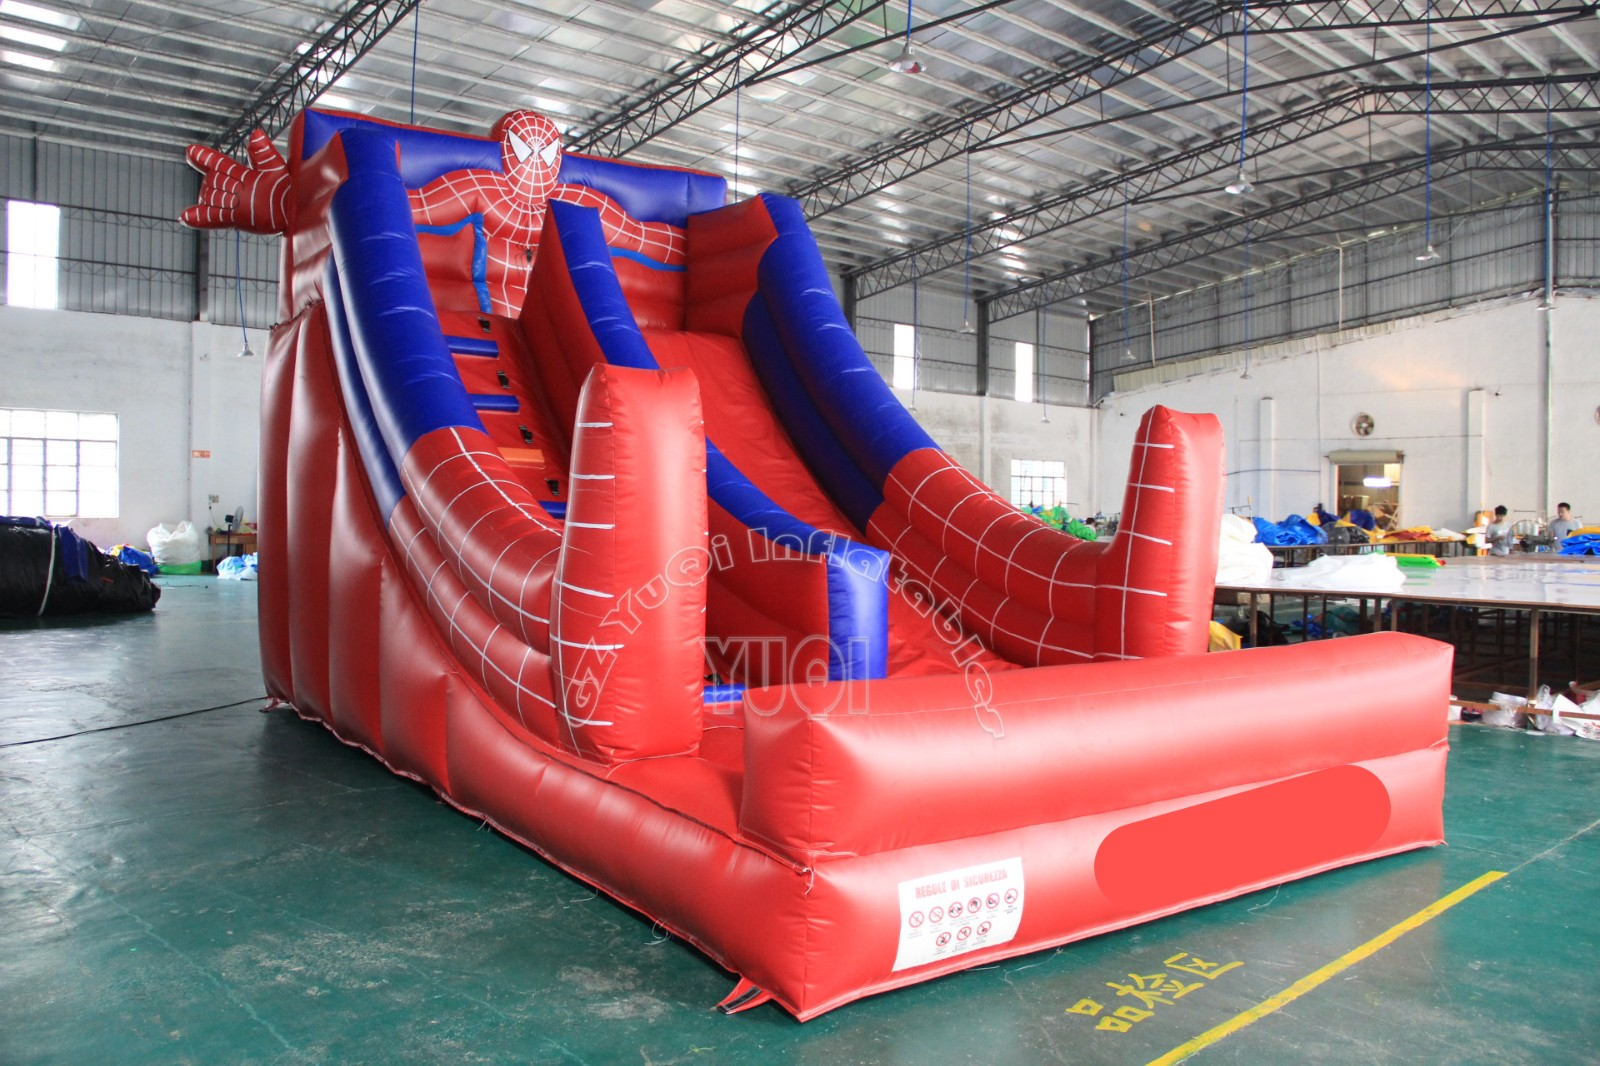 YUQI-Yq342 Popular Spiderman Blow Up Slide ,children Slide With